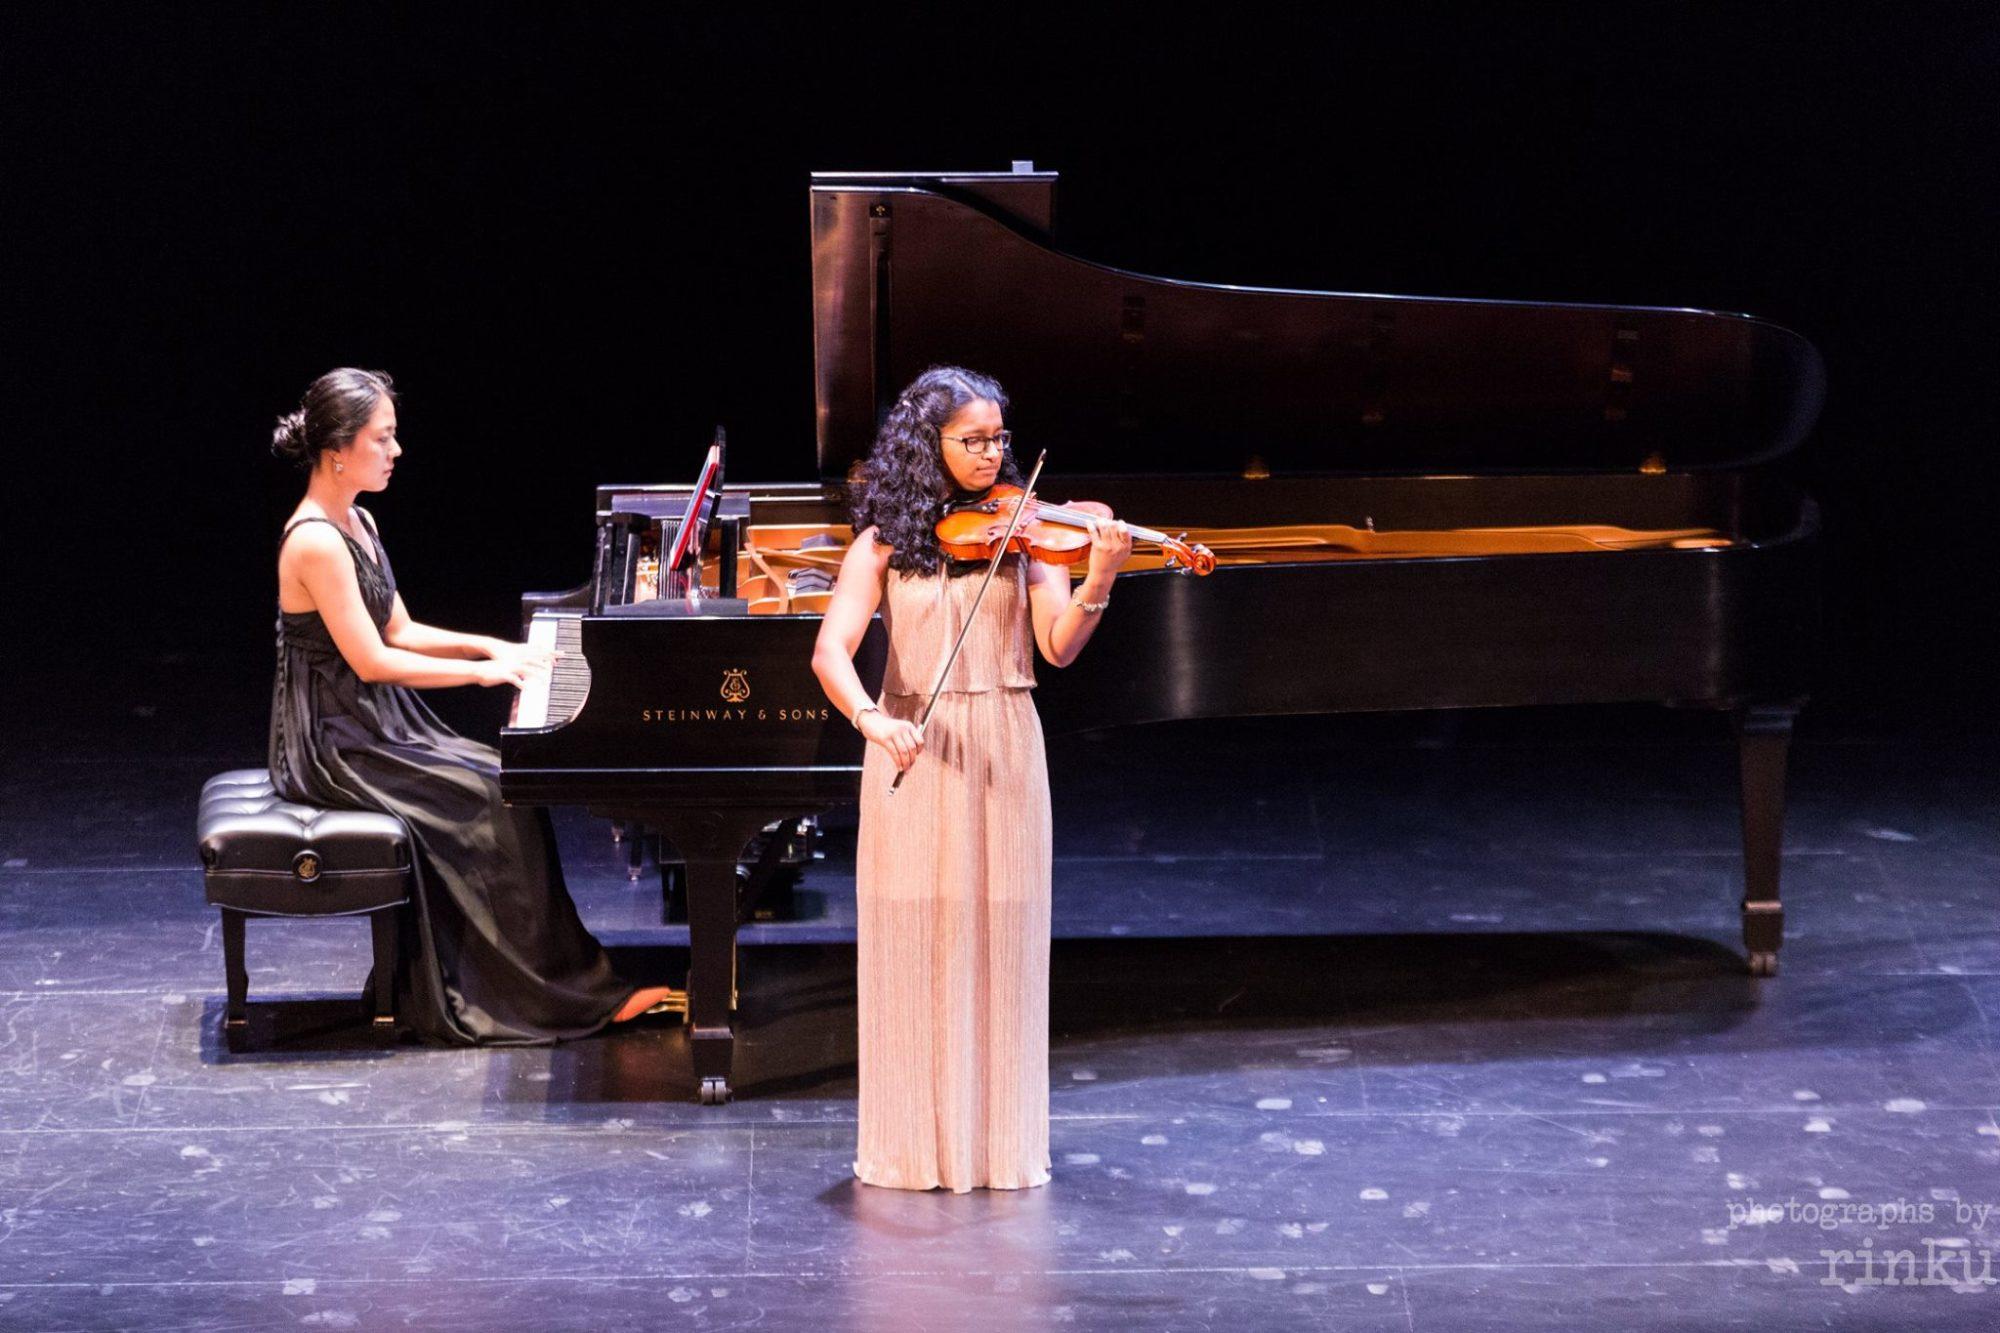 The Kennedy Center Performance | Vivaldi Music Academy